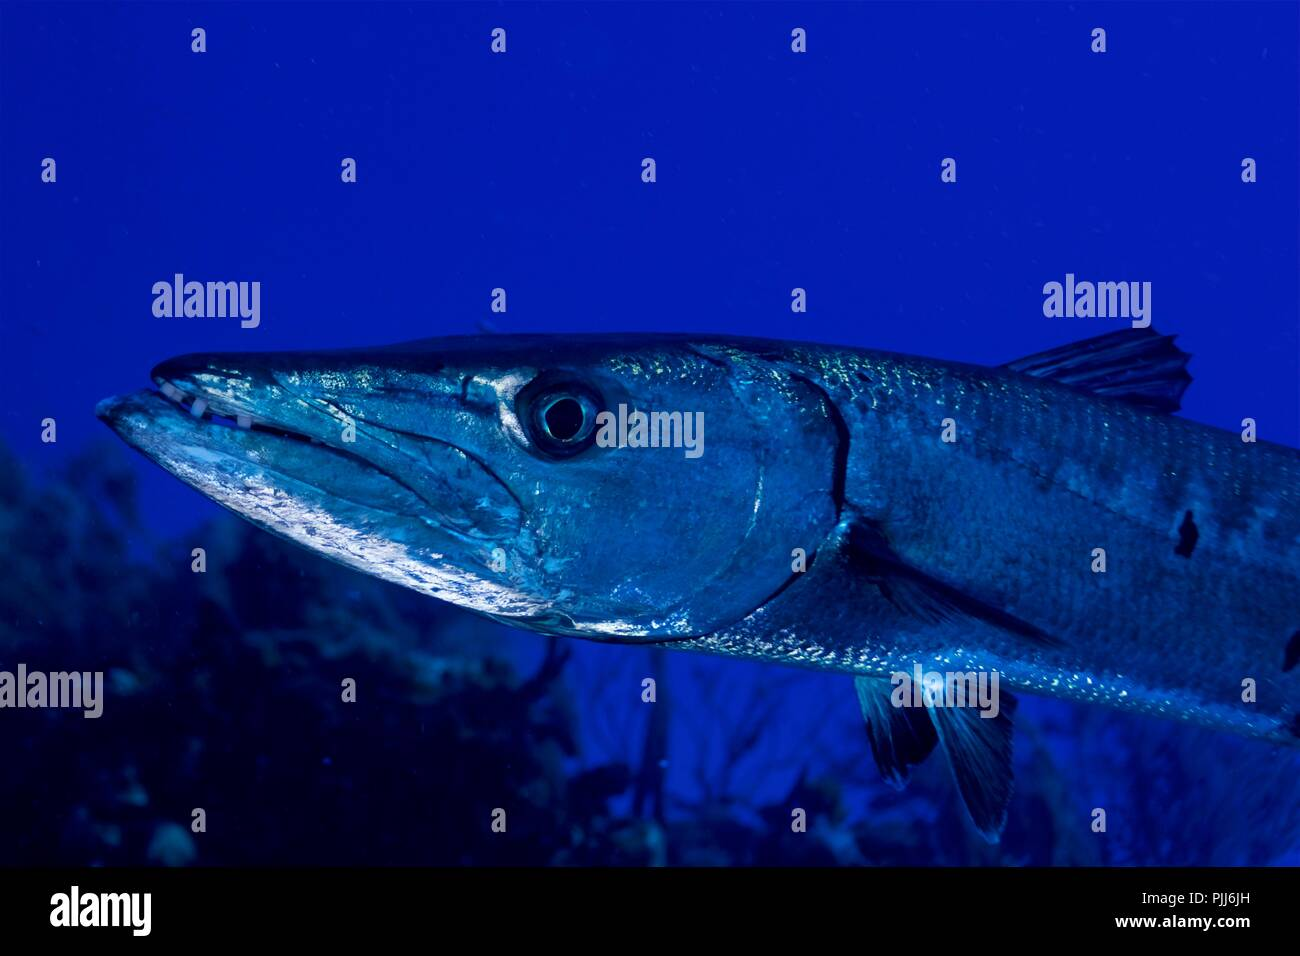 Extreme closeup, Giant Barracuda, Bahamas - Stock Image